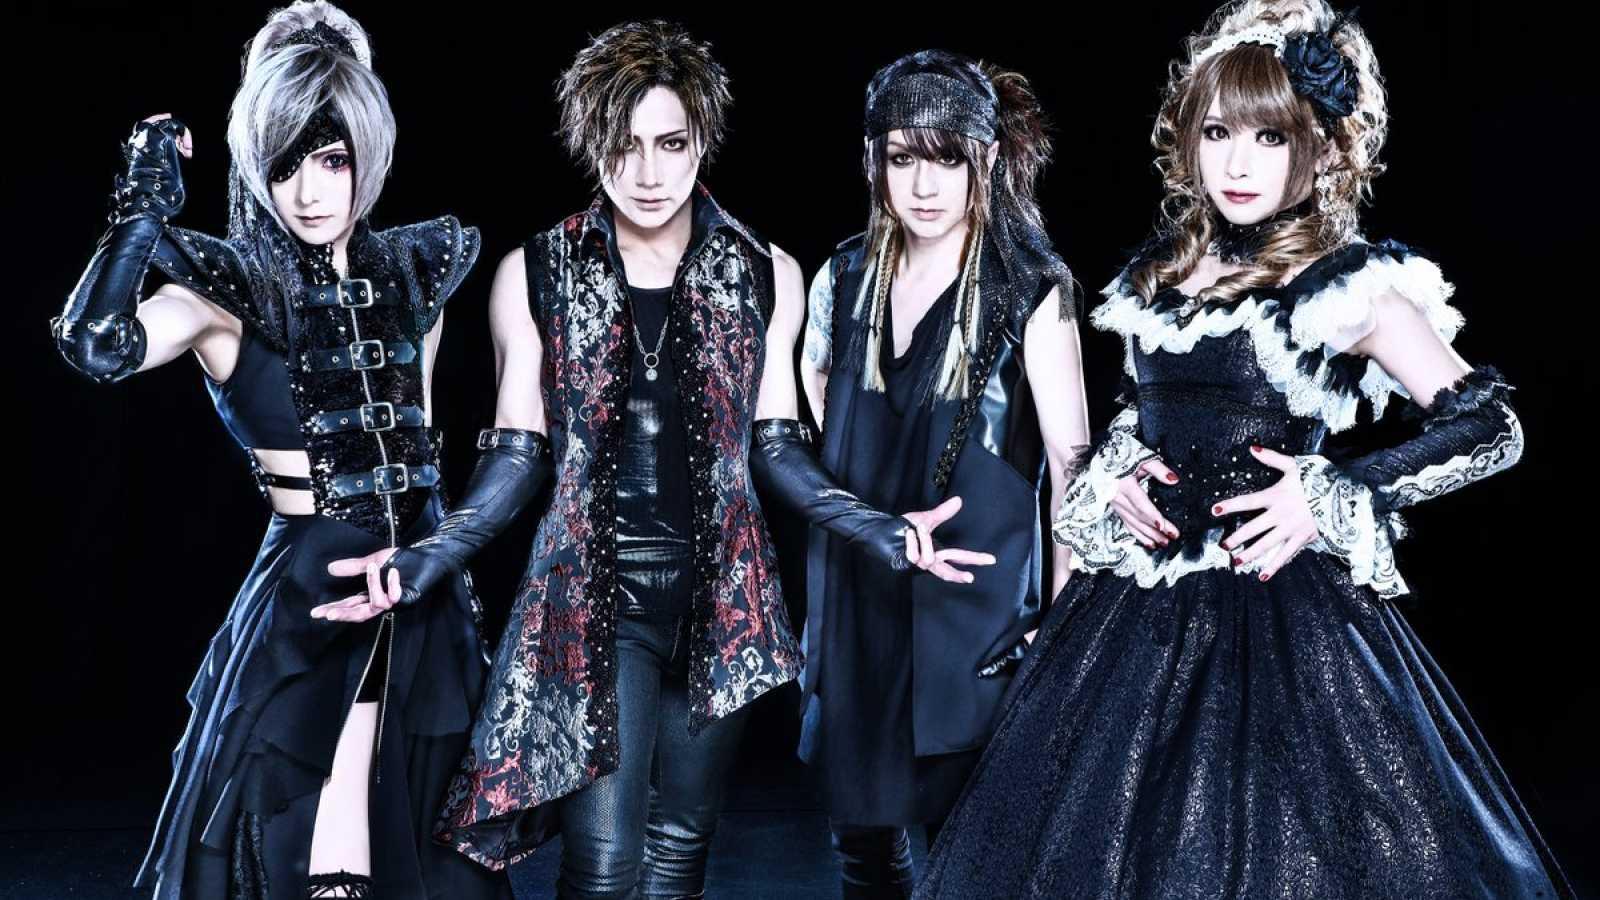 Jupiter Announce First Live Stream Concert © Jupiter. All rights reserved.